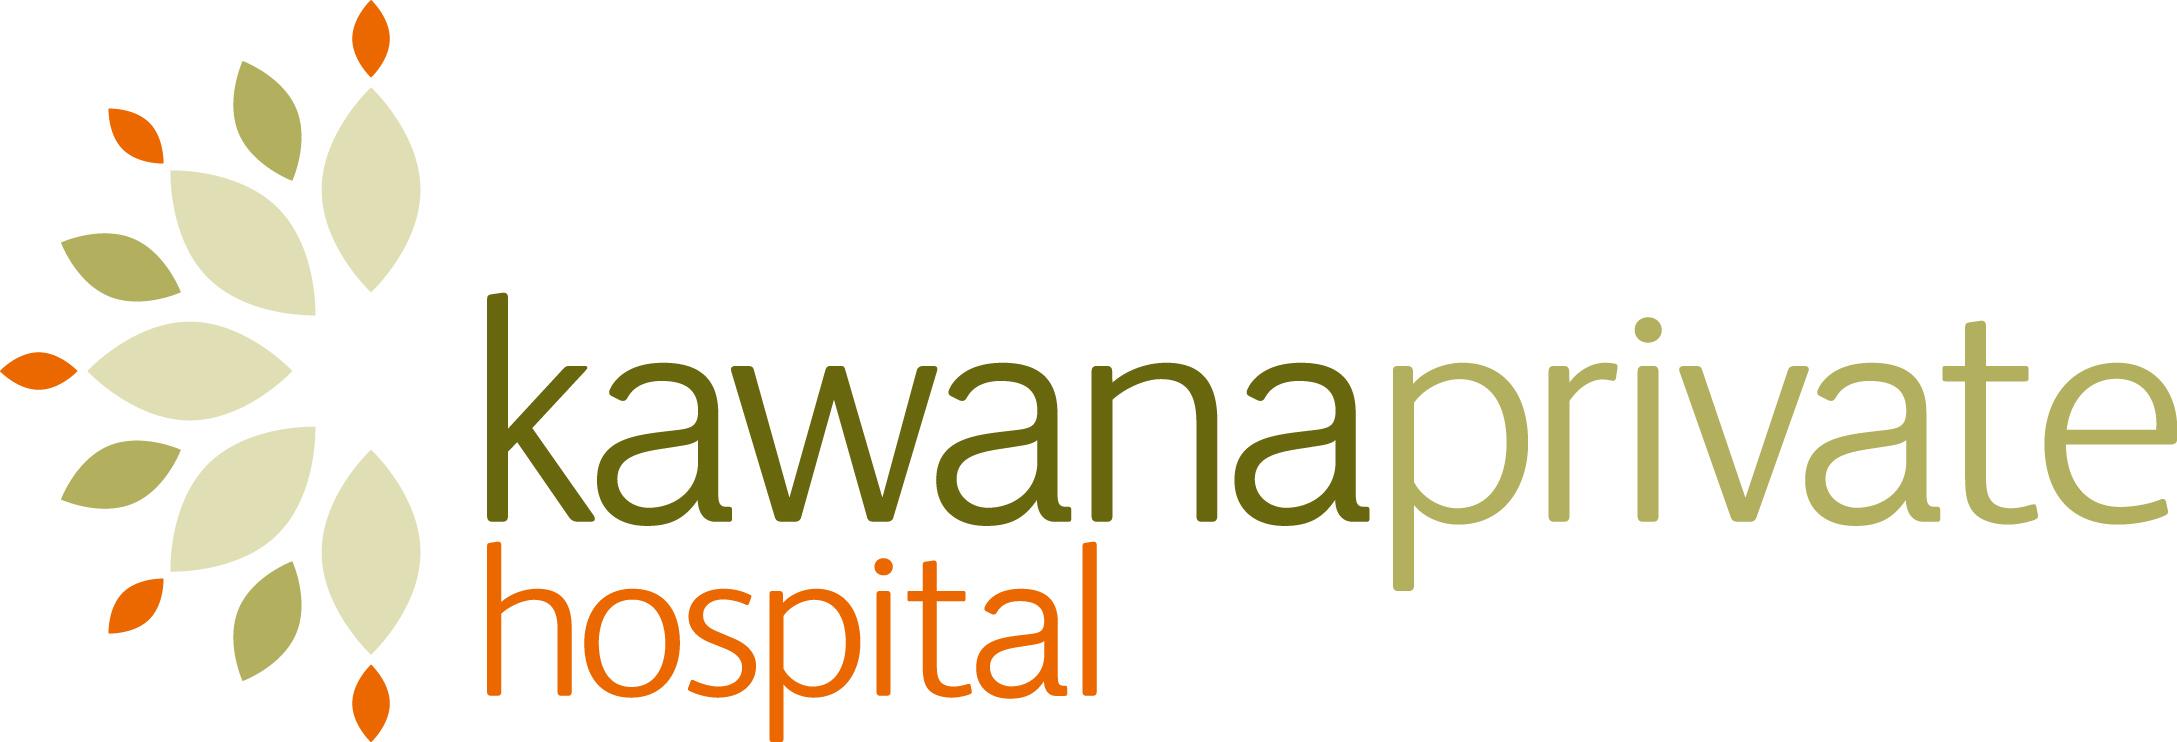 Kawana Private Hospital image